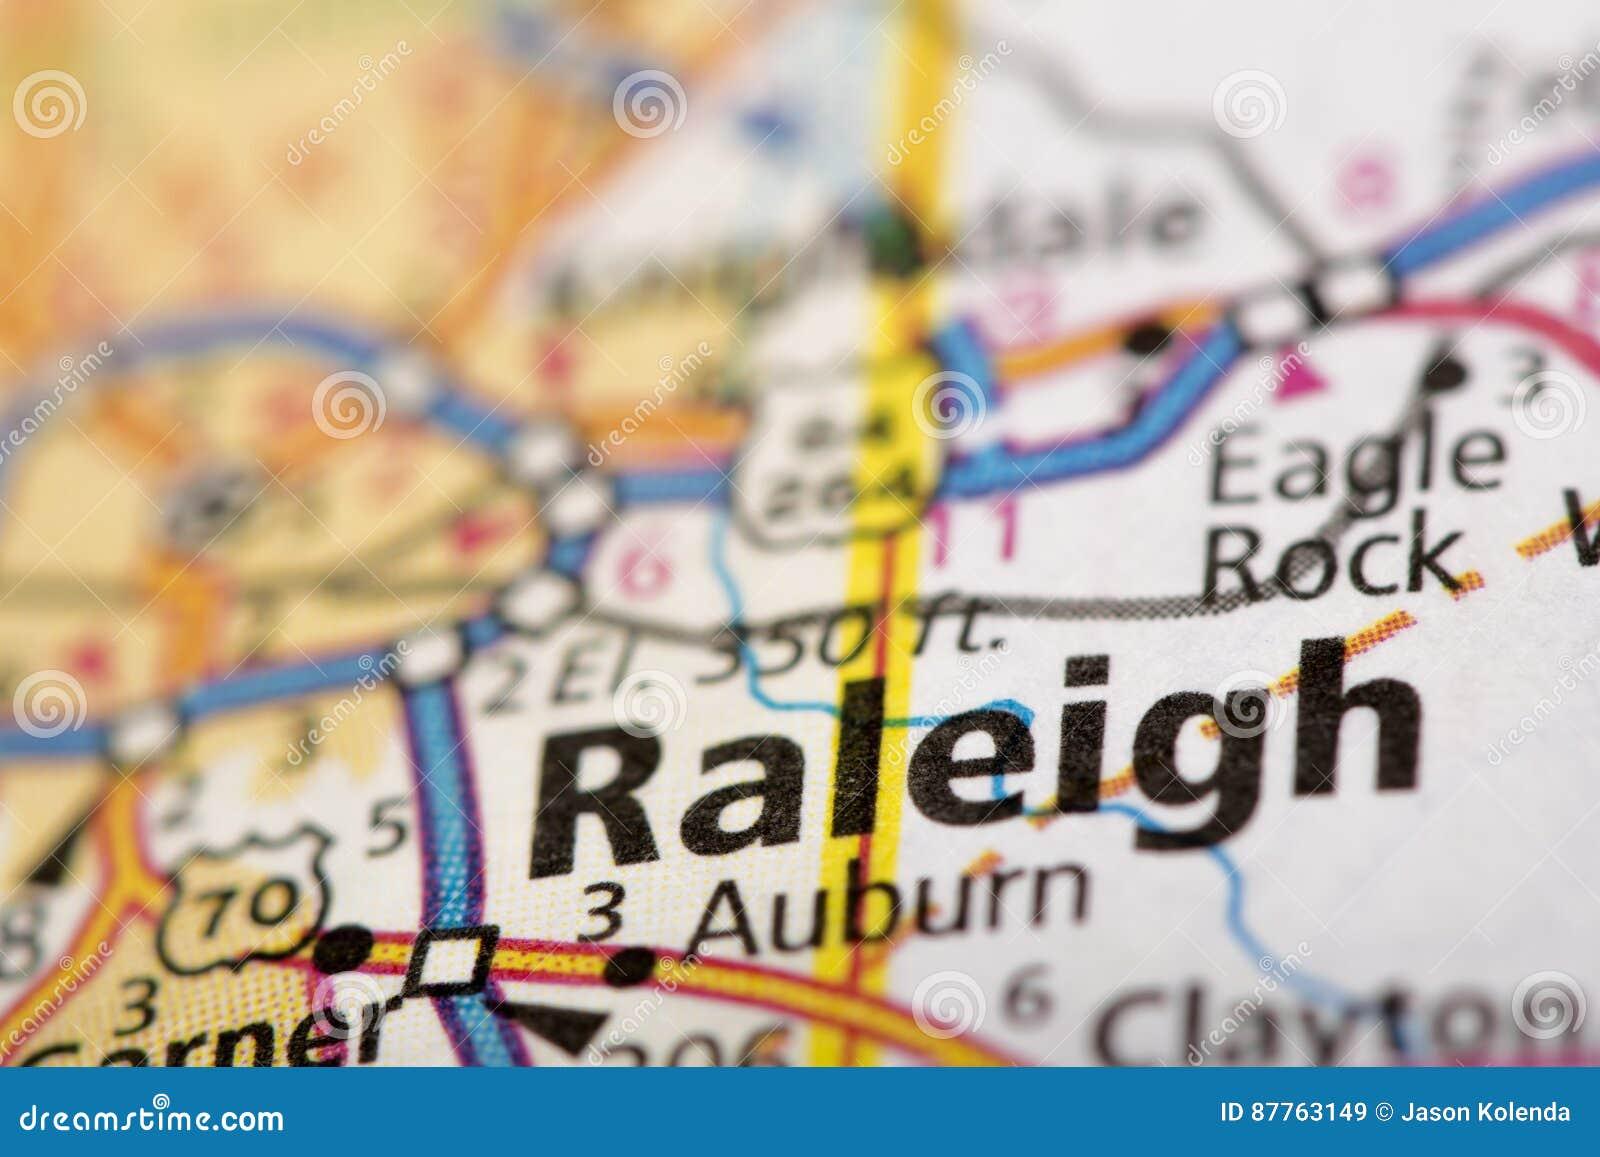 Raleigh, North Carolina auf Karte